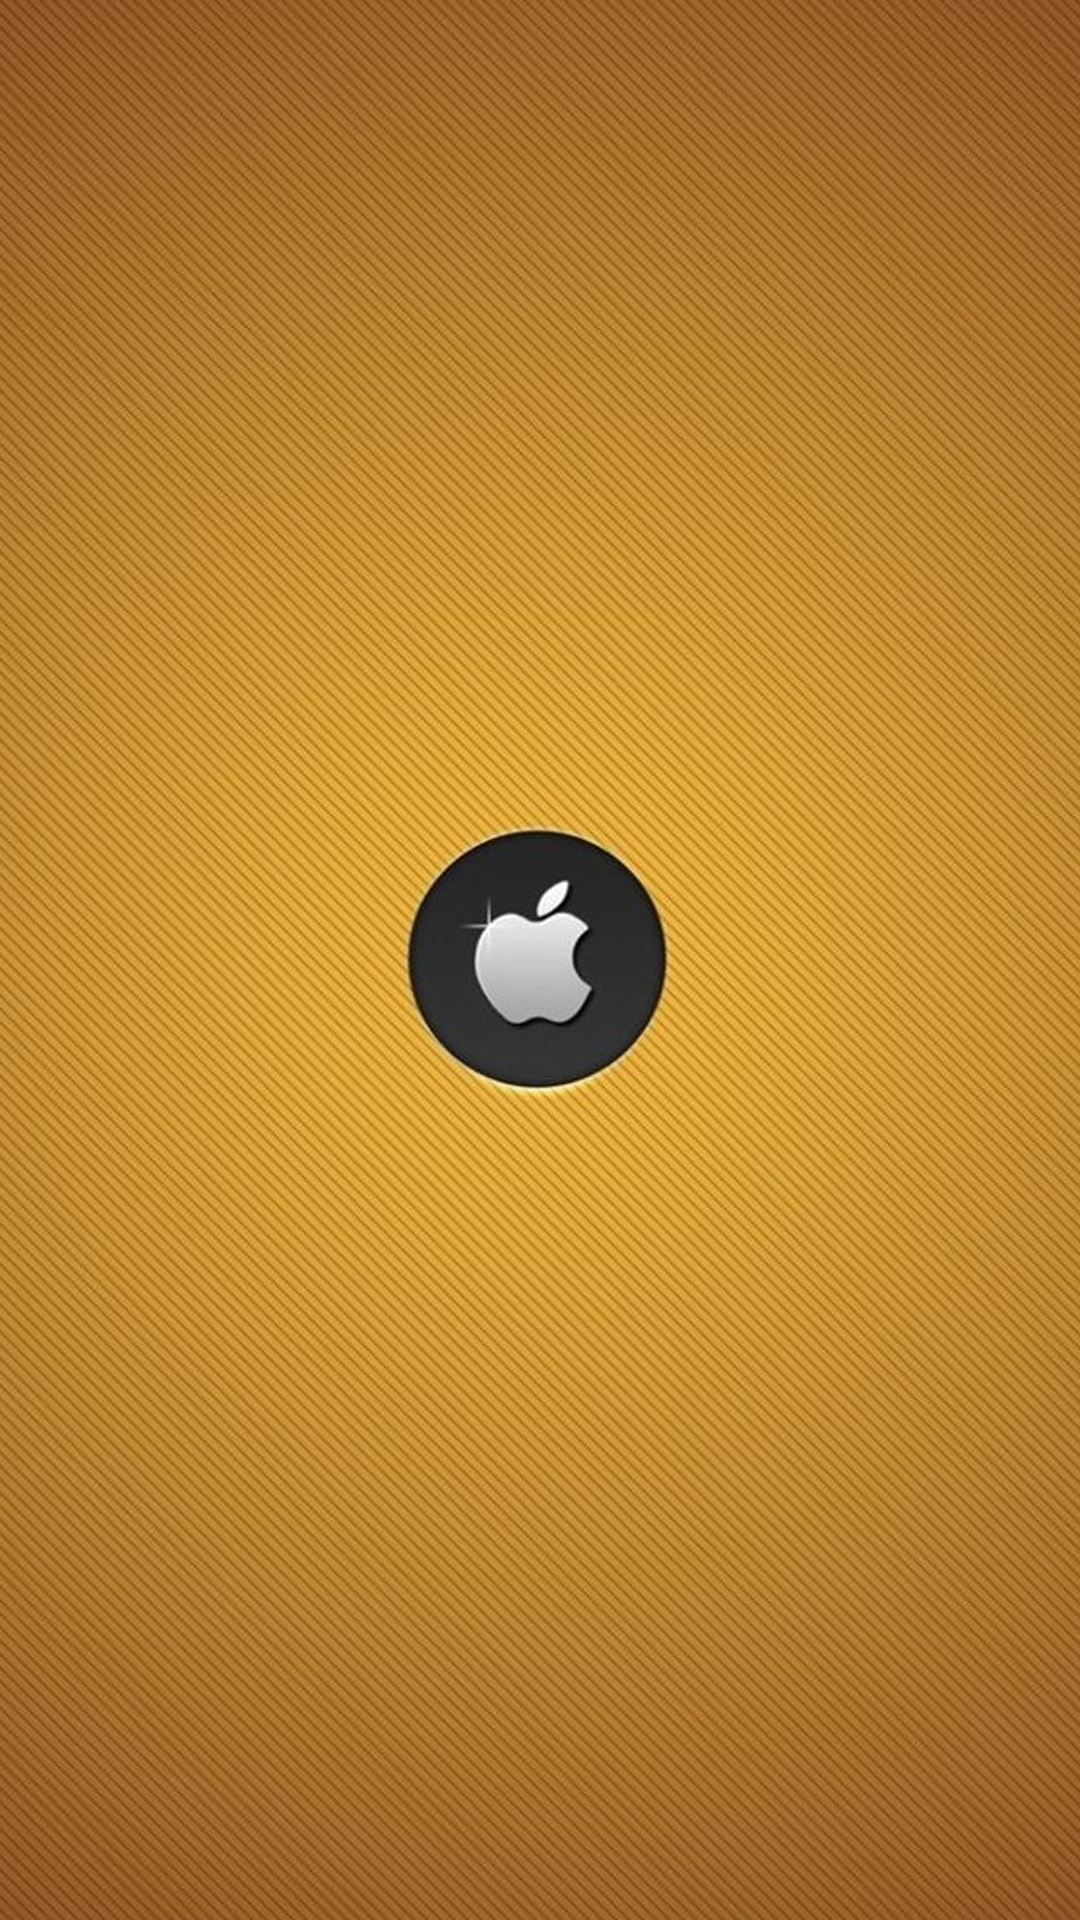 Iphone 6 Plus Wallpaper Hd Apple Idea Gallery